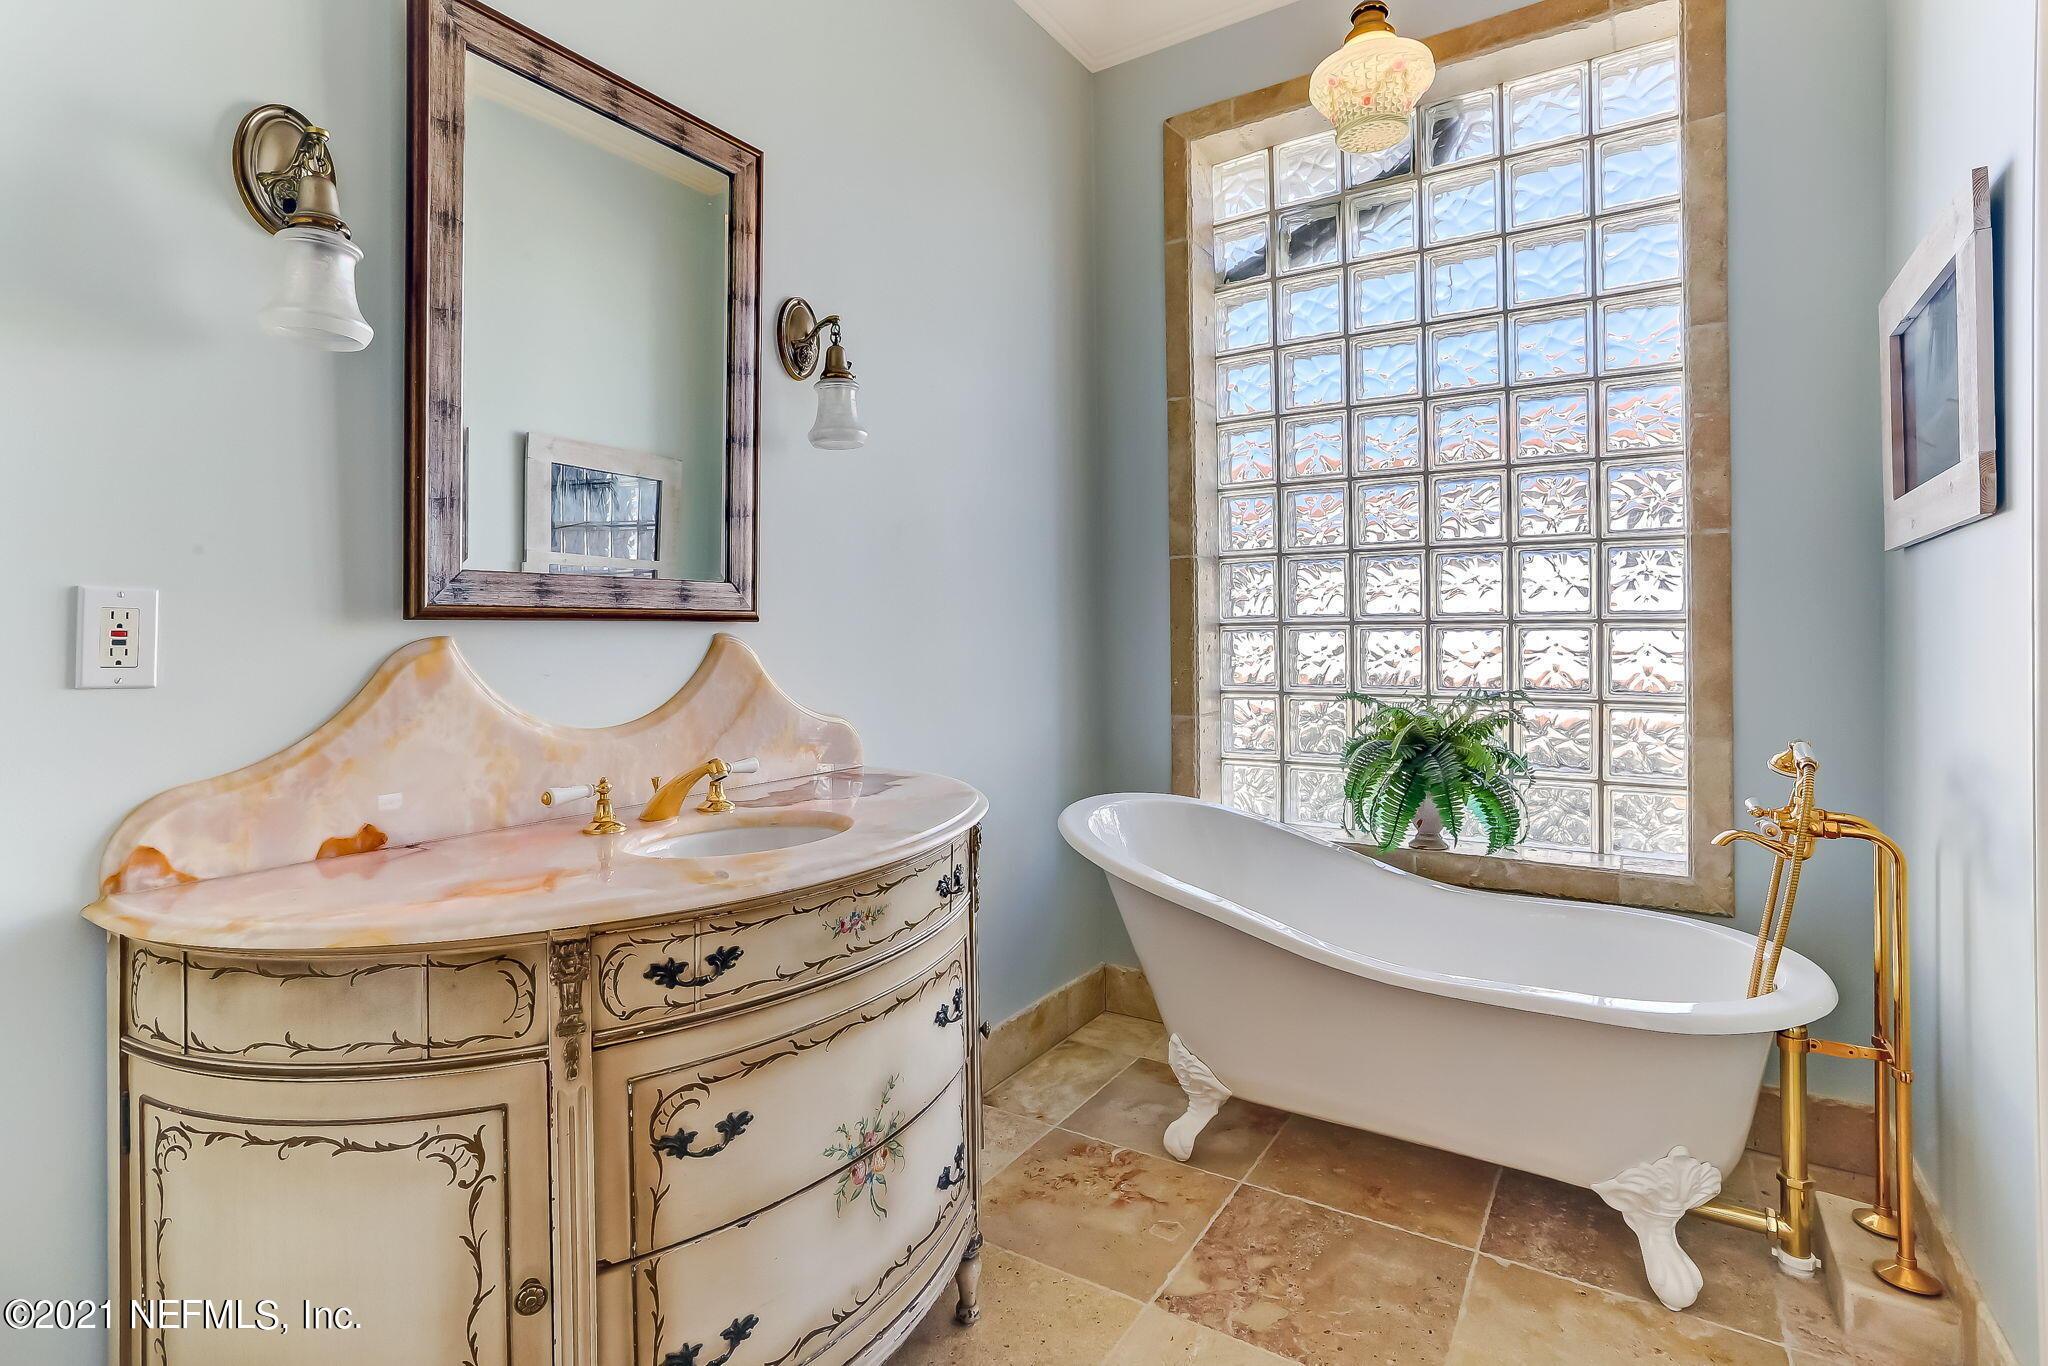 8334 SANCTUARY, AMELIA ISLAND, FLORIDA 32034, 5 Bedrooms Bedrooms, ,6 BathroomsBathrooms,Residential,For sale,SANCTUARY,1098692